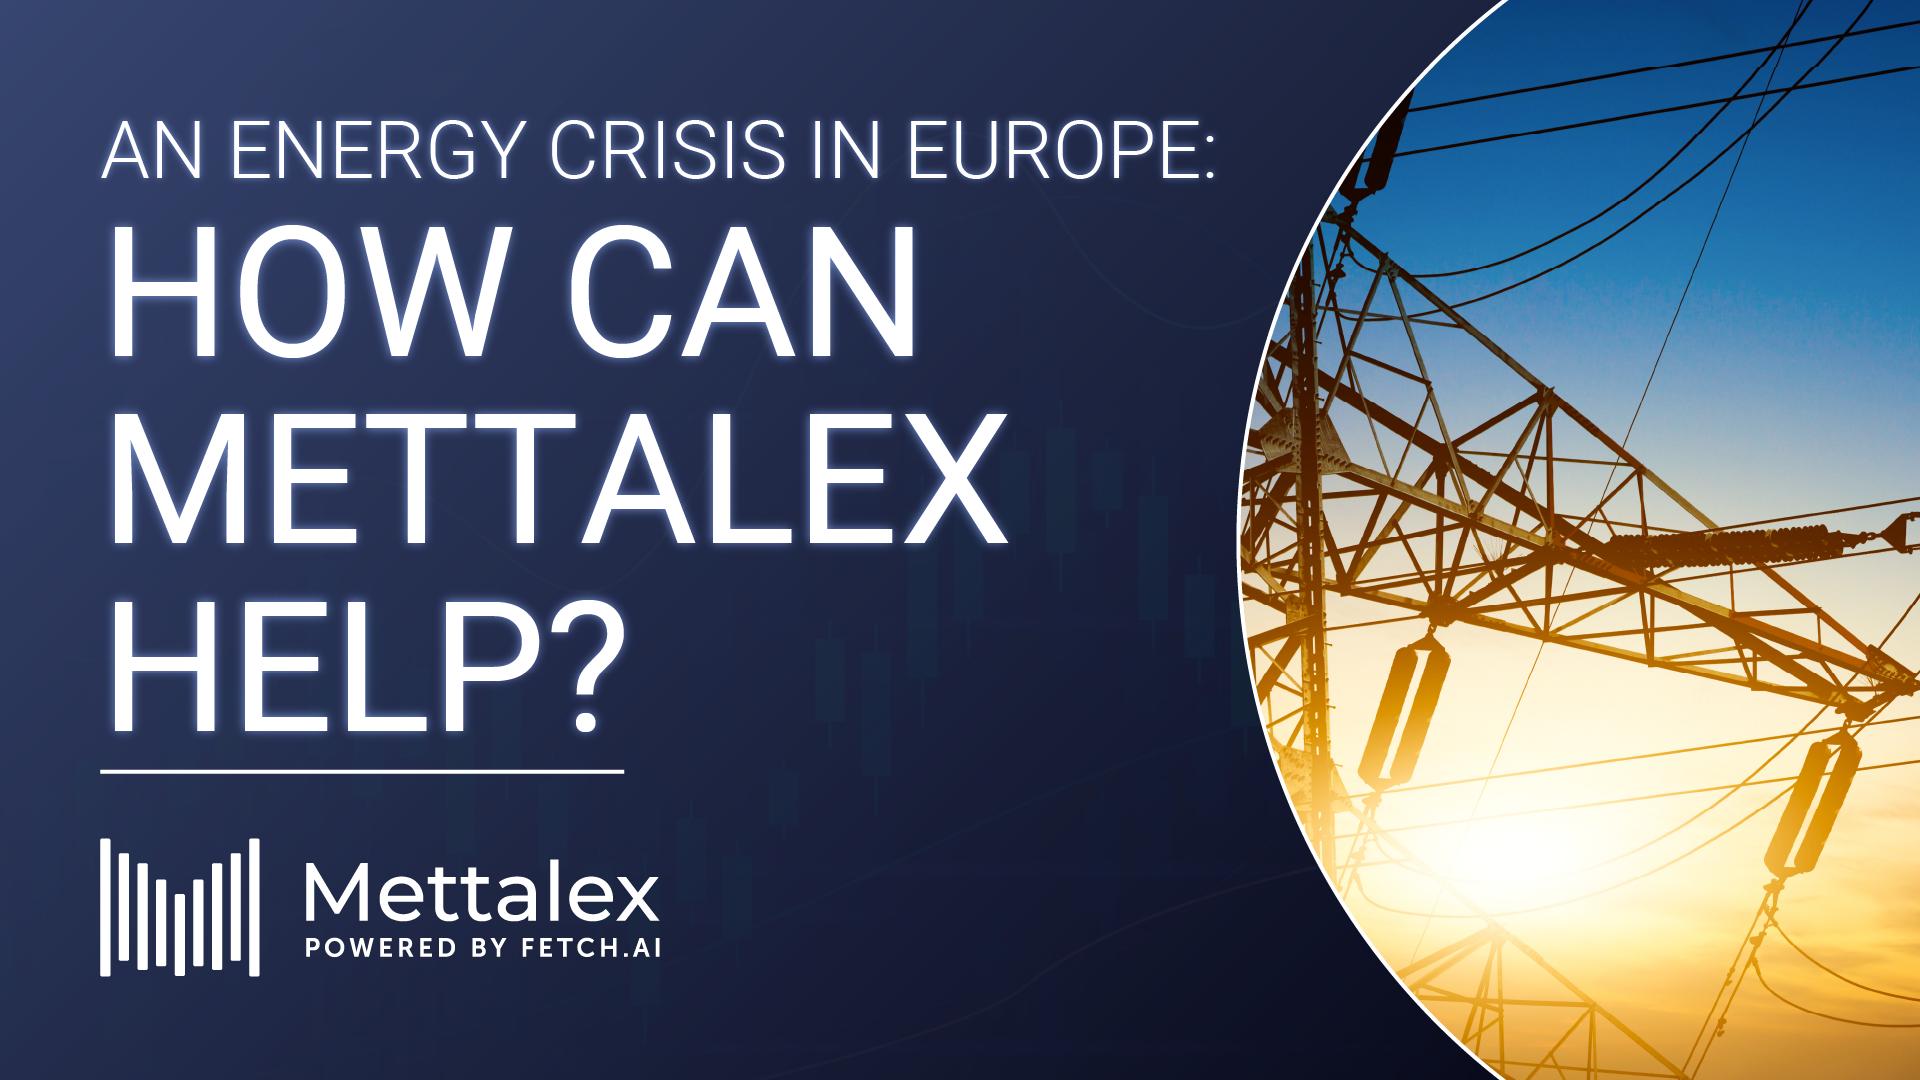 https://mettalex.com/wp-content/uploads/MTLX-Energy-Crisis-1.png